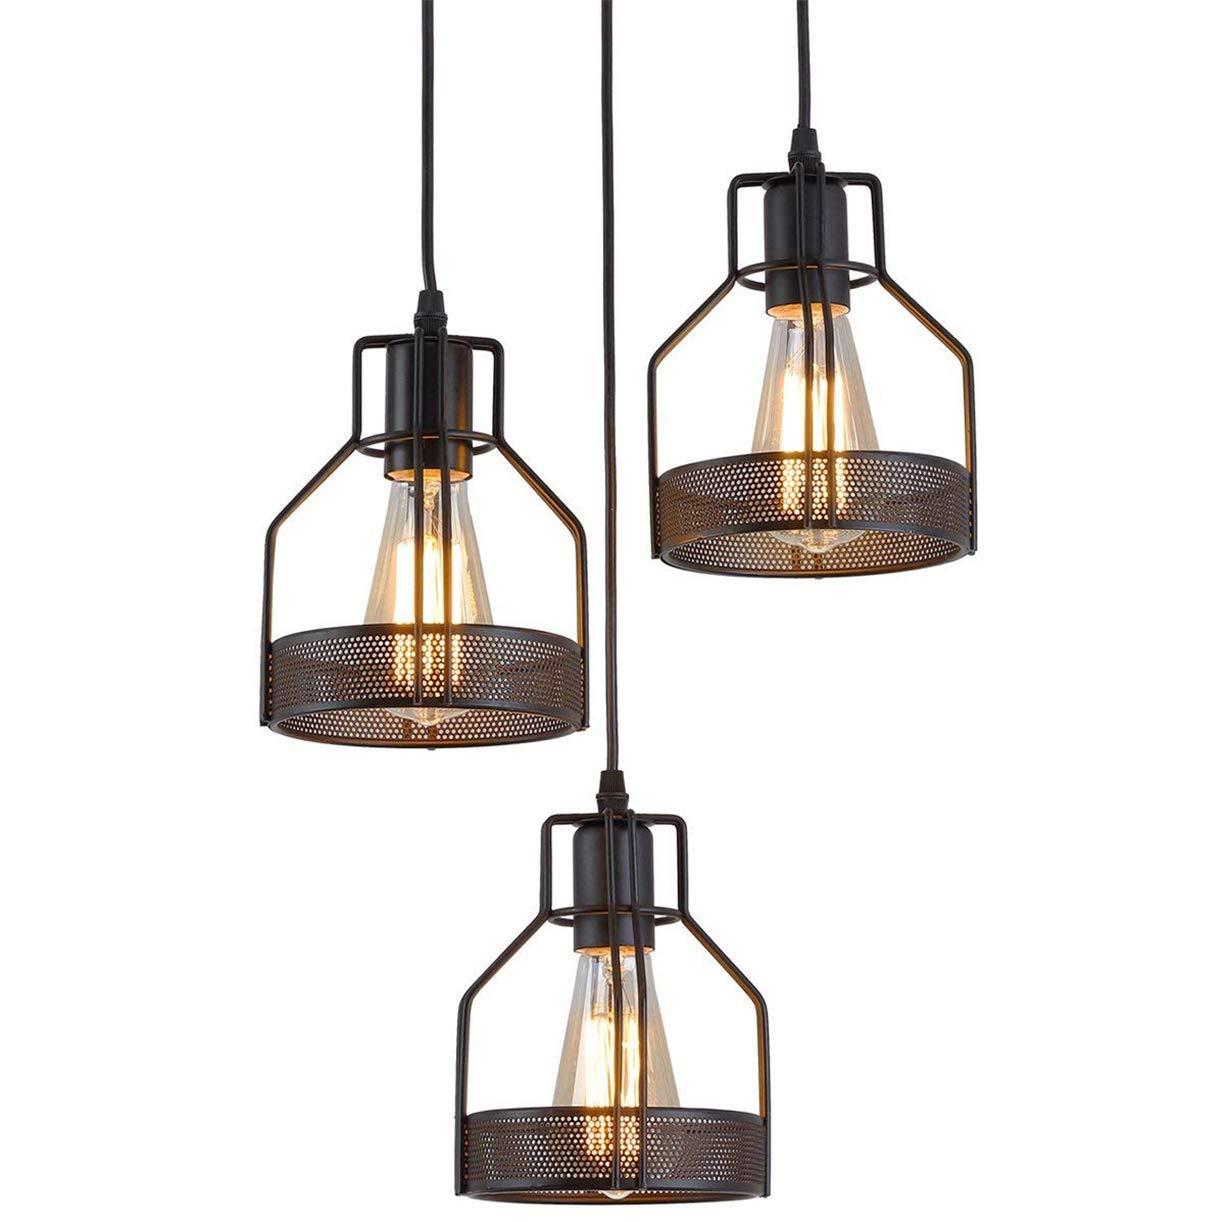 Design round vintage led pendant lamp retro hanging lamp e26 e27 industrial black metal 3 flame ceiling lamp for living dining room restaurant basement